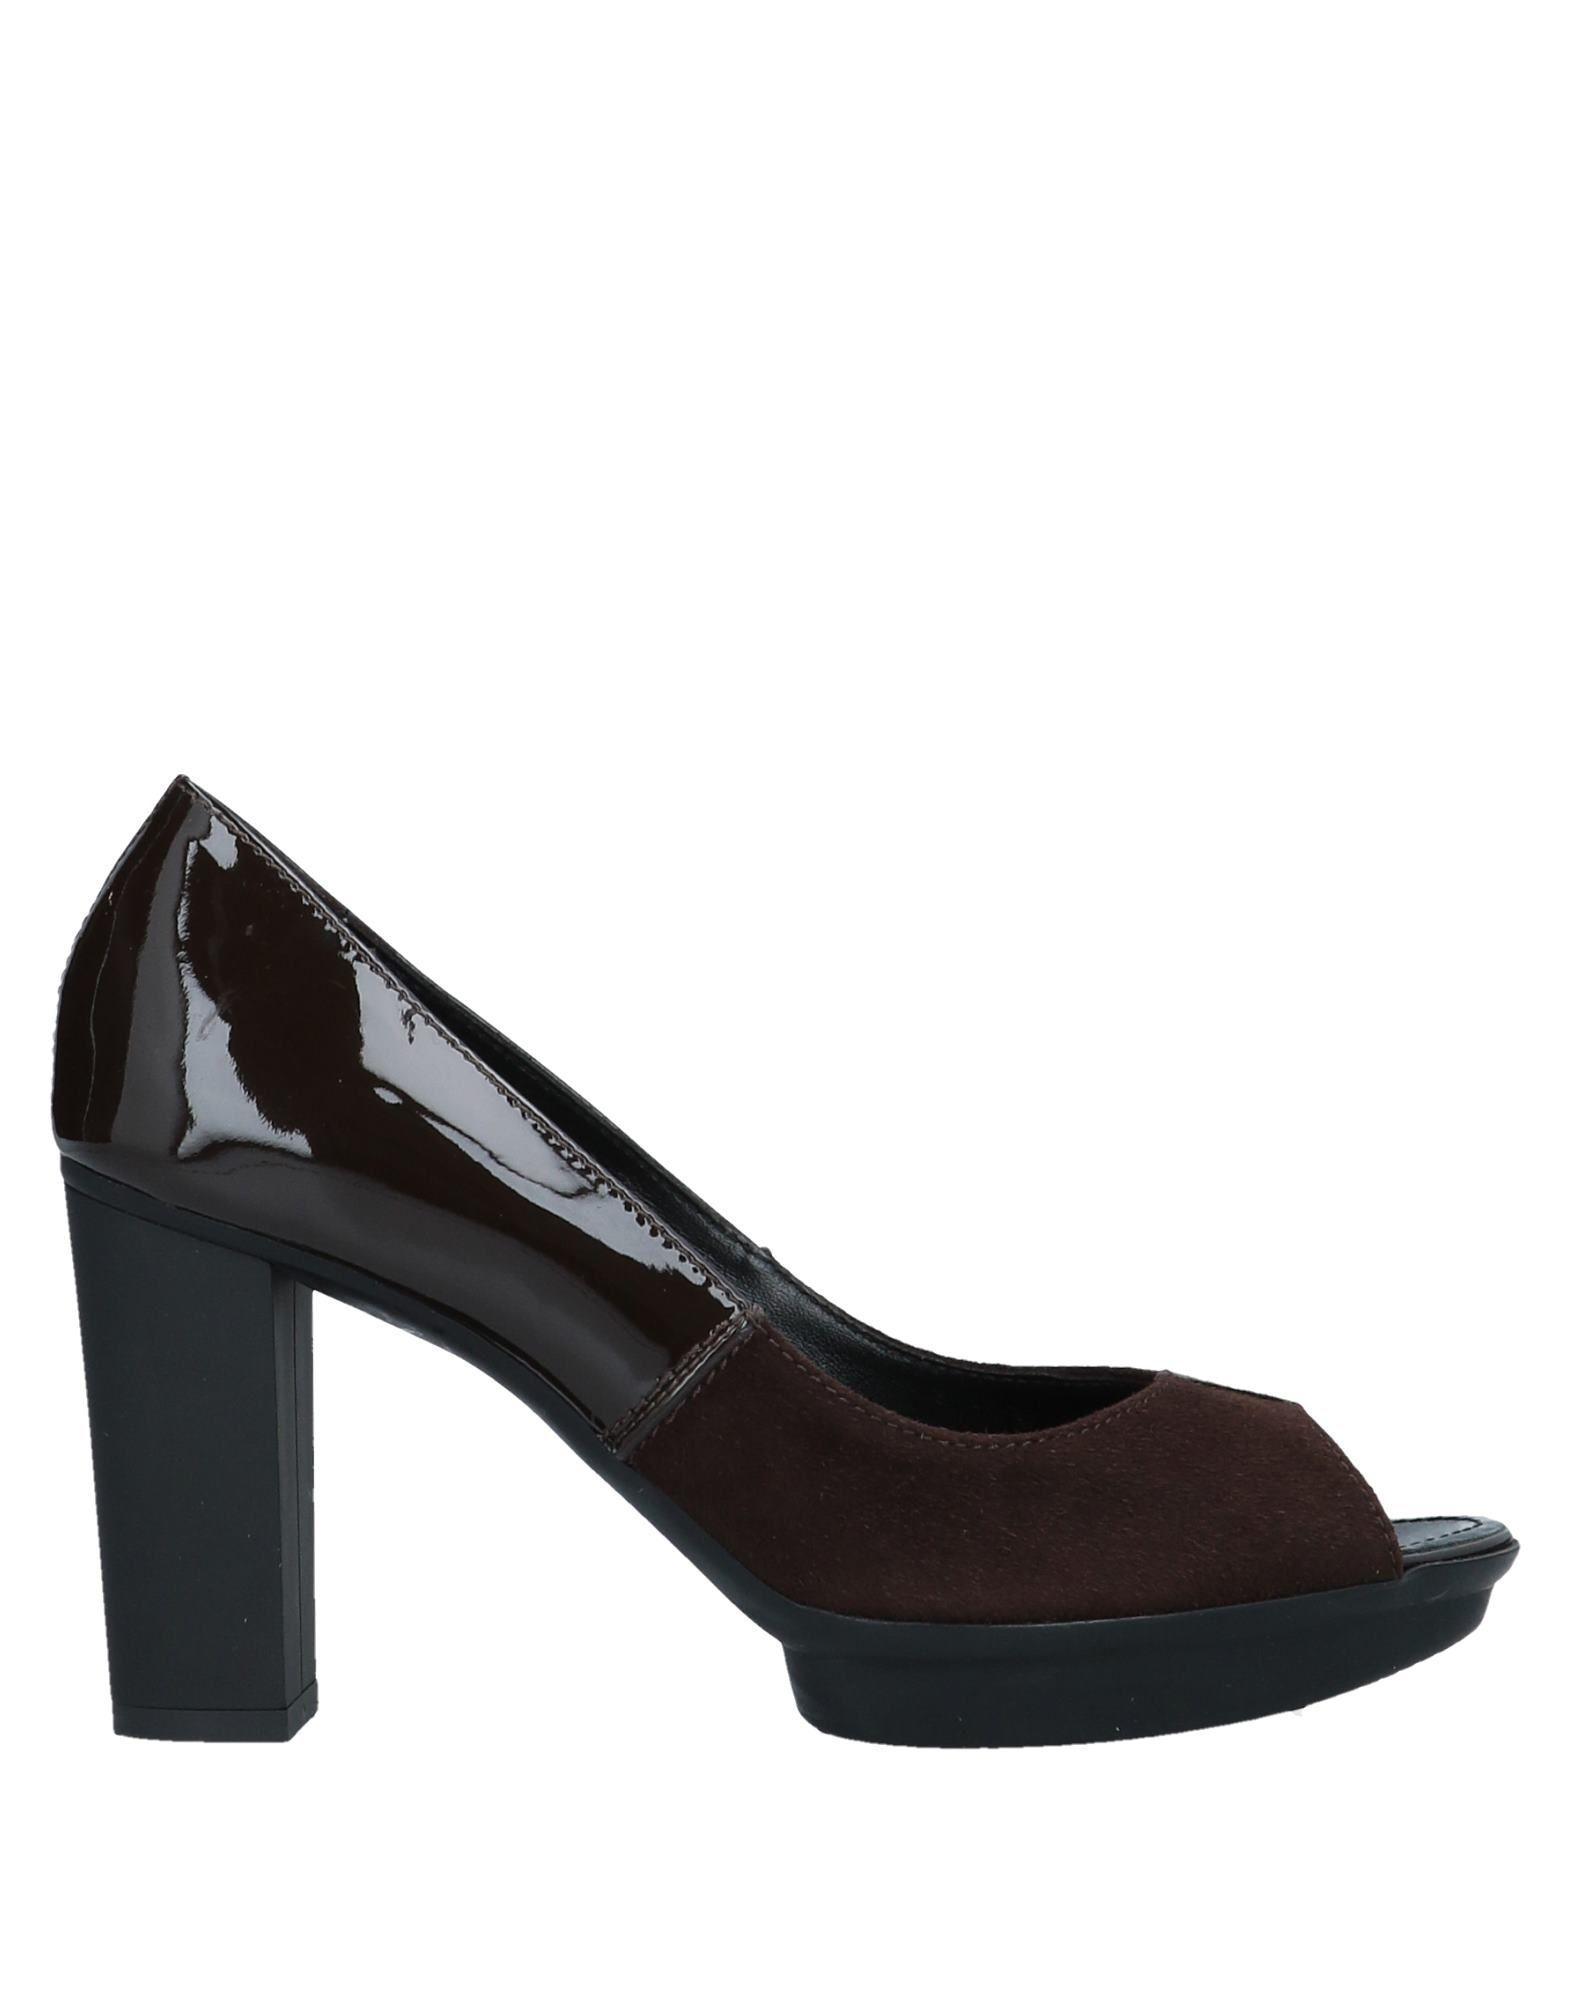 Escarpins Hogan Femme - Escarpins Hogan Moka Chaussures casual sauvages